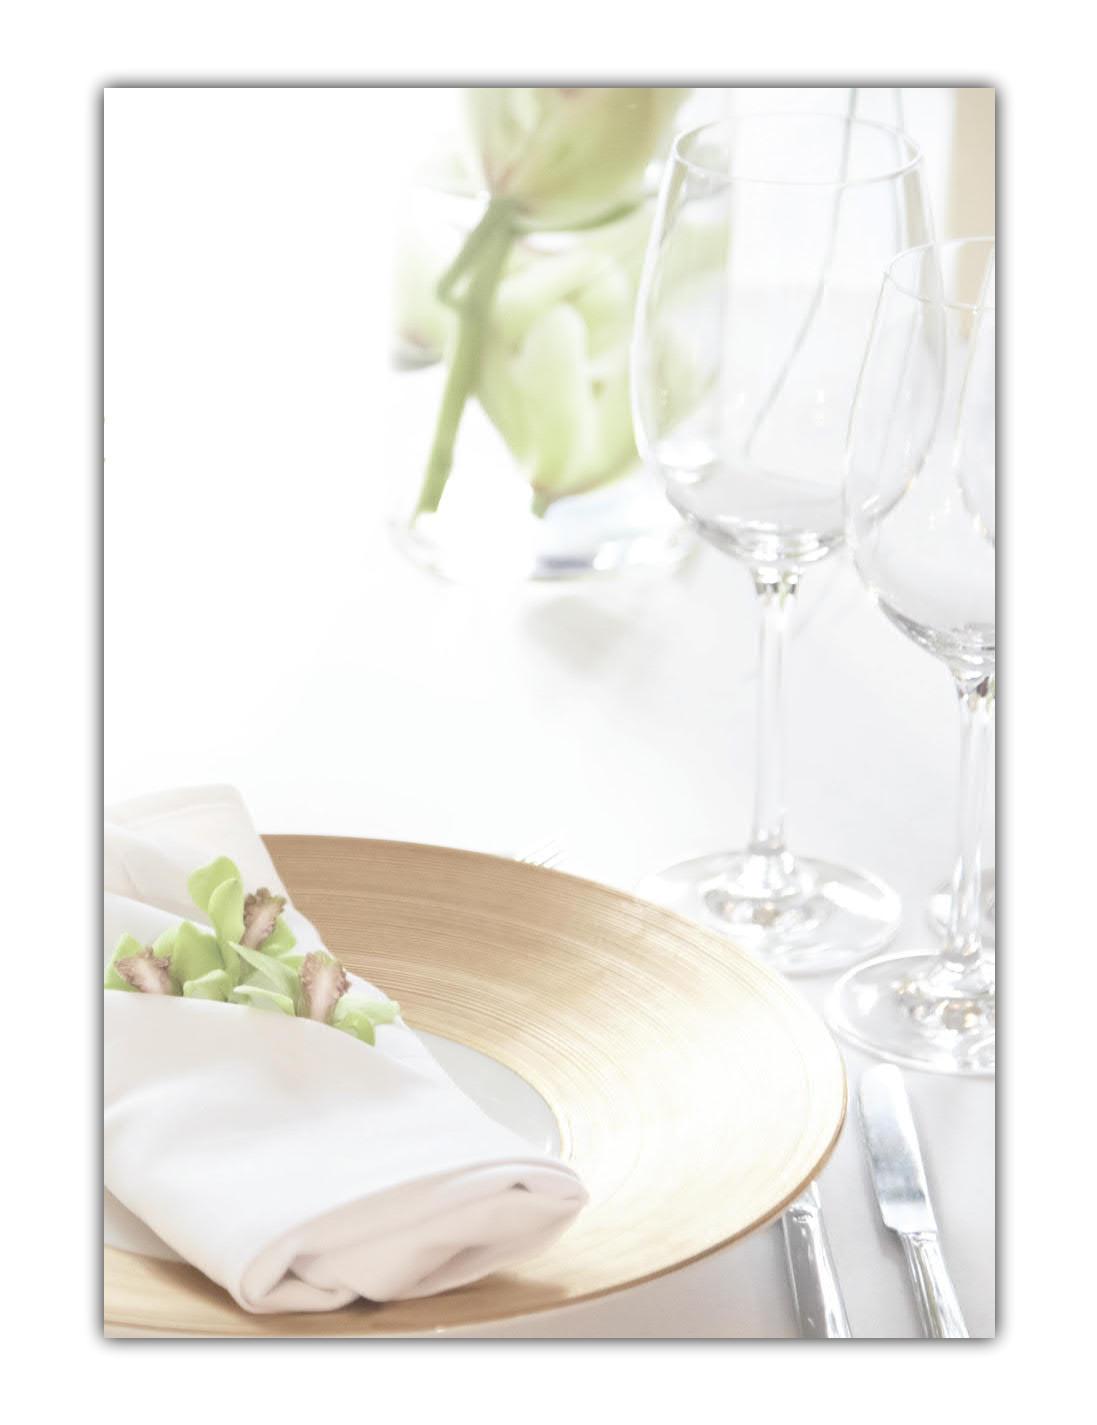 Gastronomie Motivpapier Briefpapier (MPA-5207, DIN A4, 100 Blatt) Motiv Restaurant Gläser Glas Teller Serviette Besteck